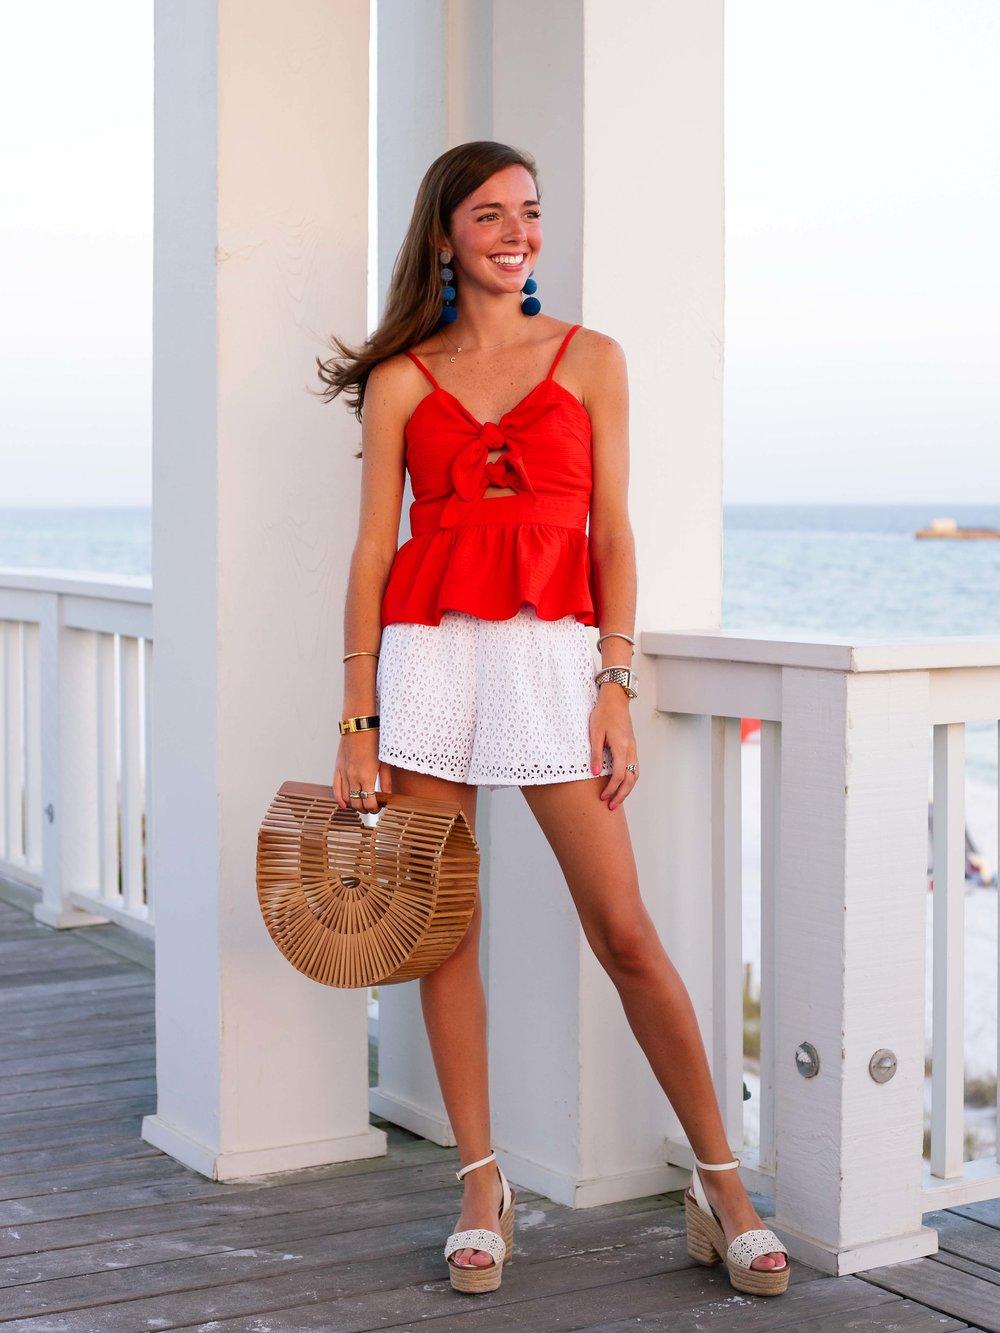 lcb style fashion blogger seaside florida beach fourth of july  (20 of 28) copy.jpg